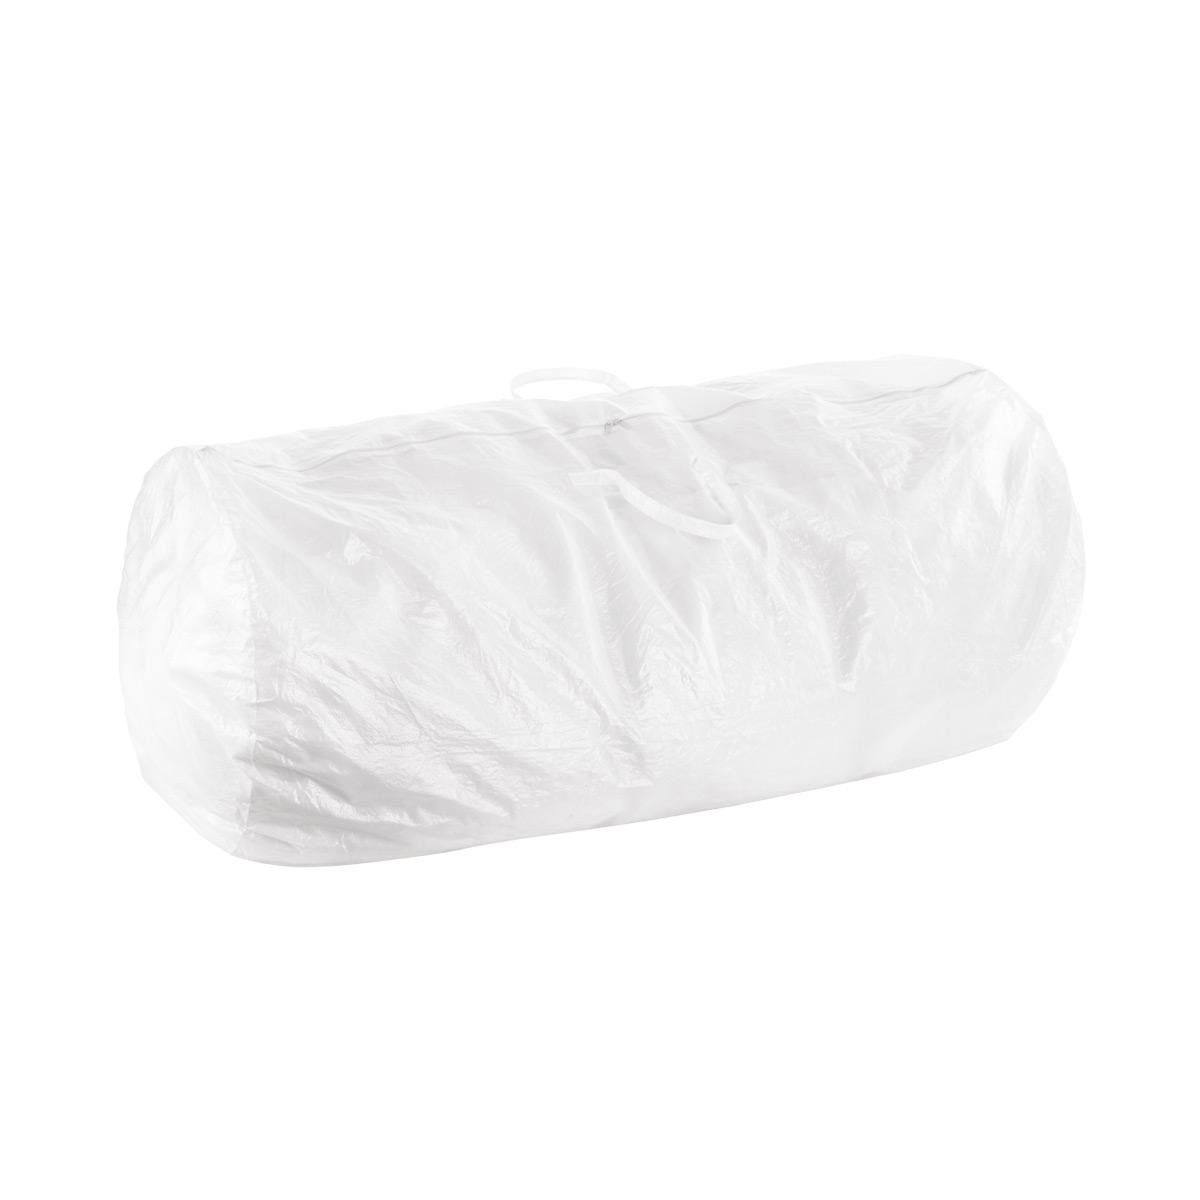 All-Purpose Storage Bag